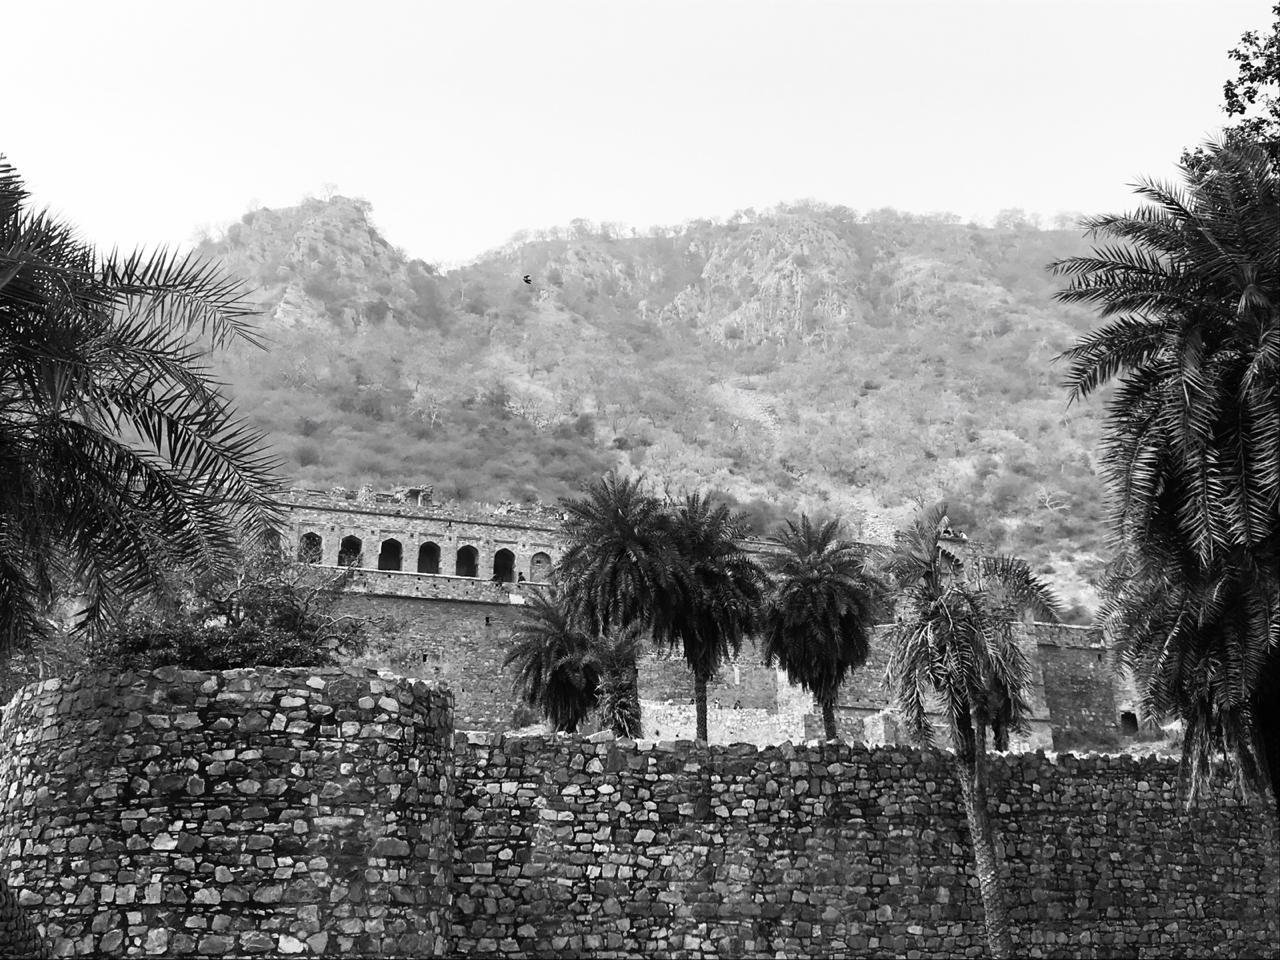 Photo of Bhangarh Fort By SHubham Pathak